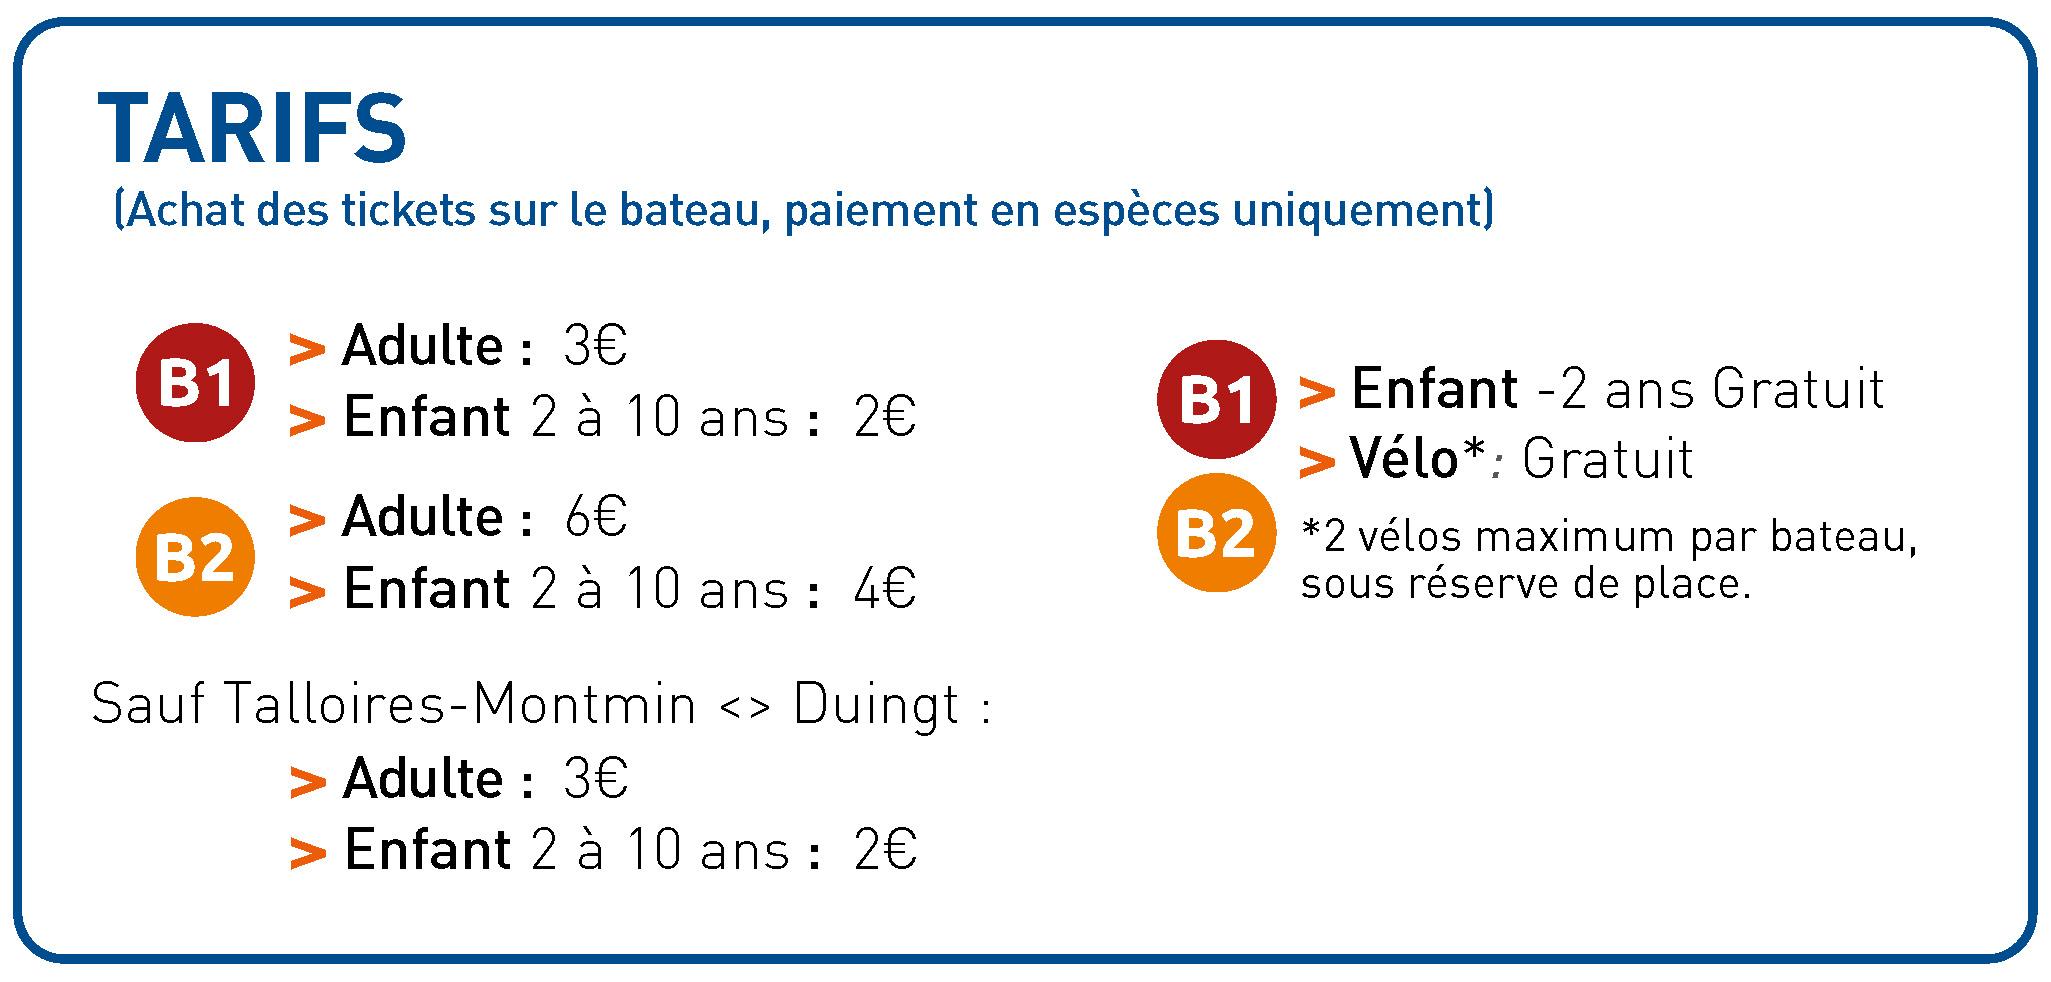 Tarification B1 et B2 - 2021